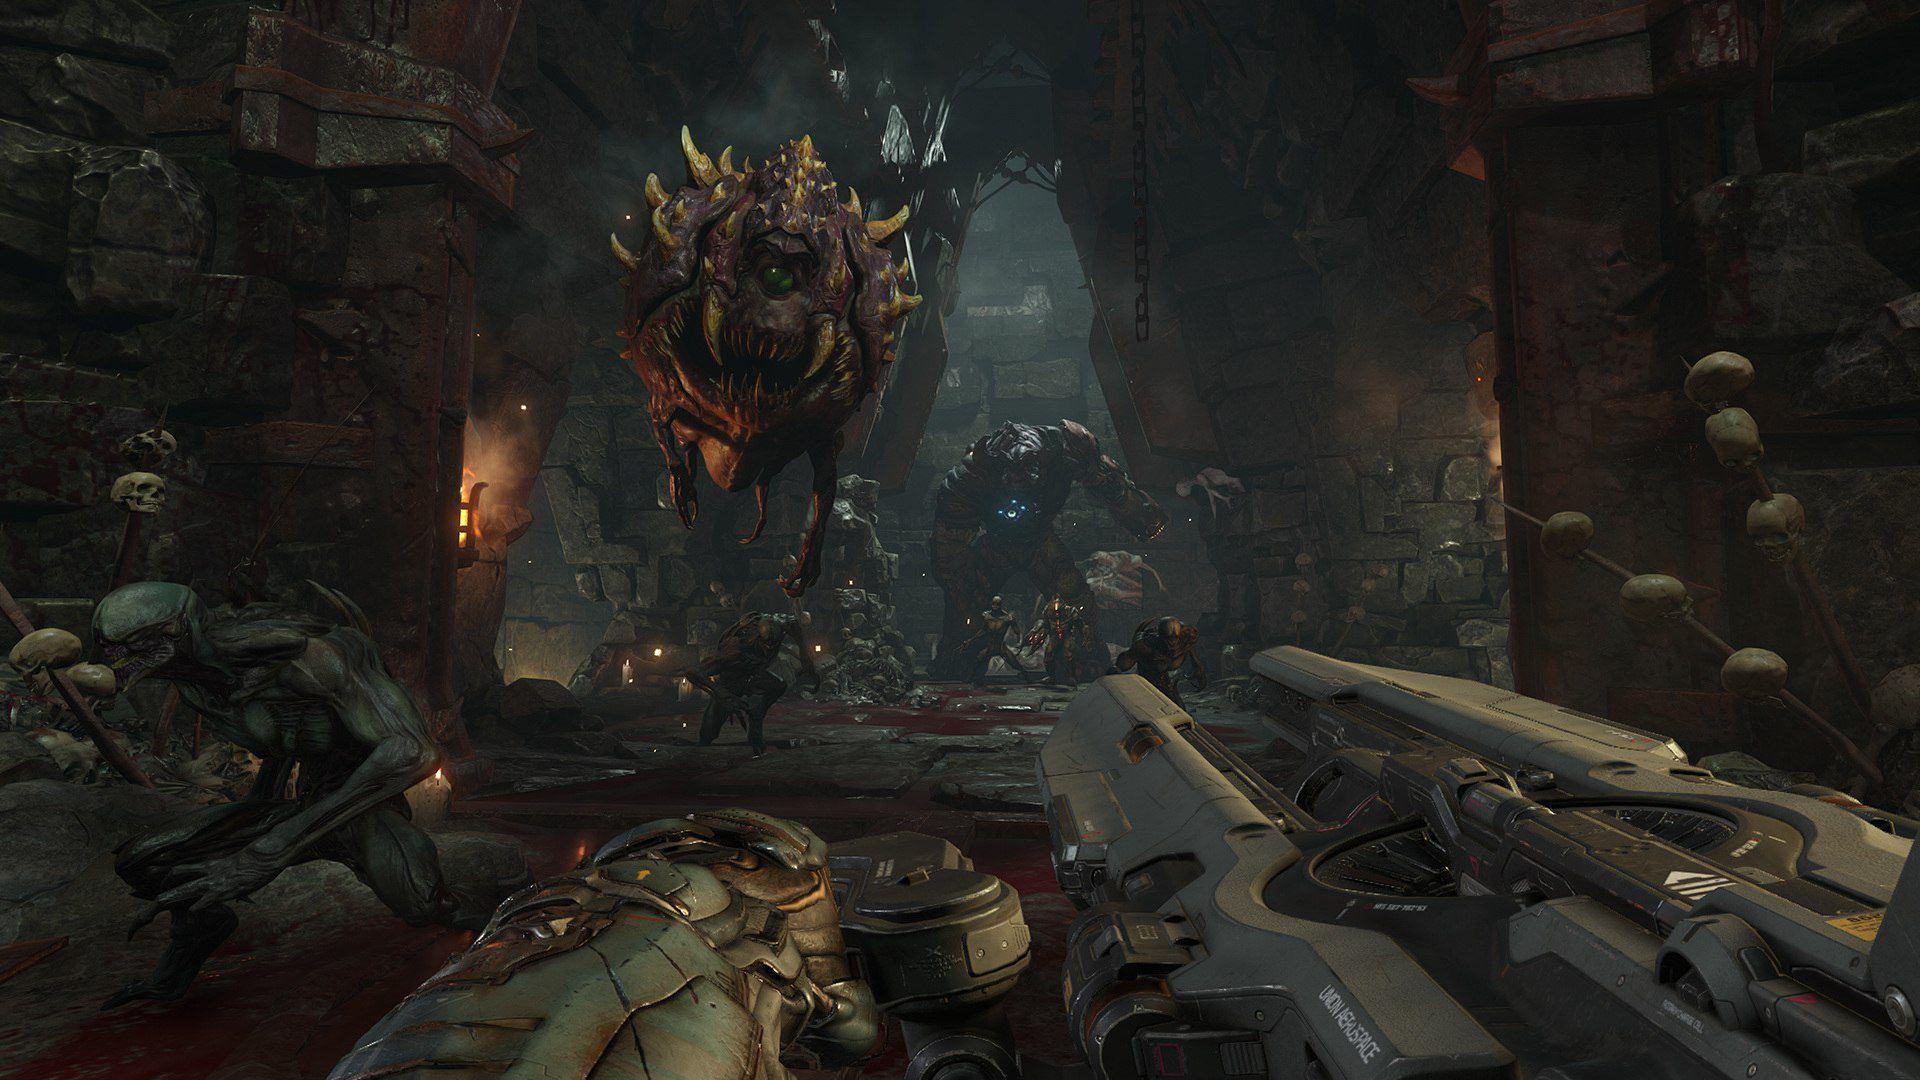 Doom Closed Alpha Pc System Requirements Doom Doom 4 Doom Game